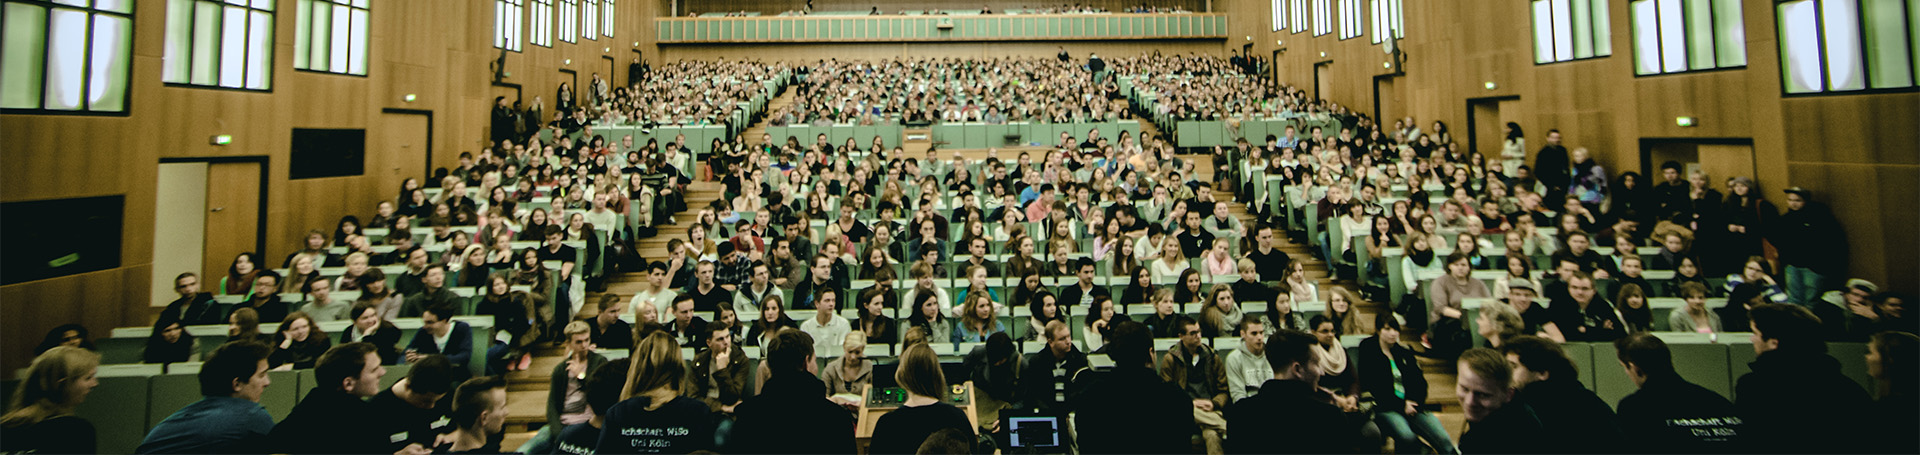 Wiso Beratung Uni Köln